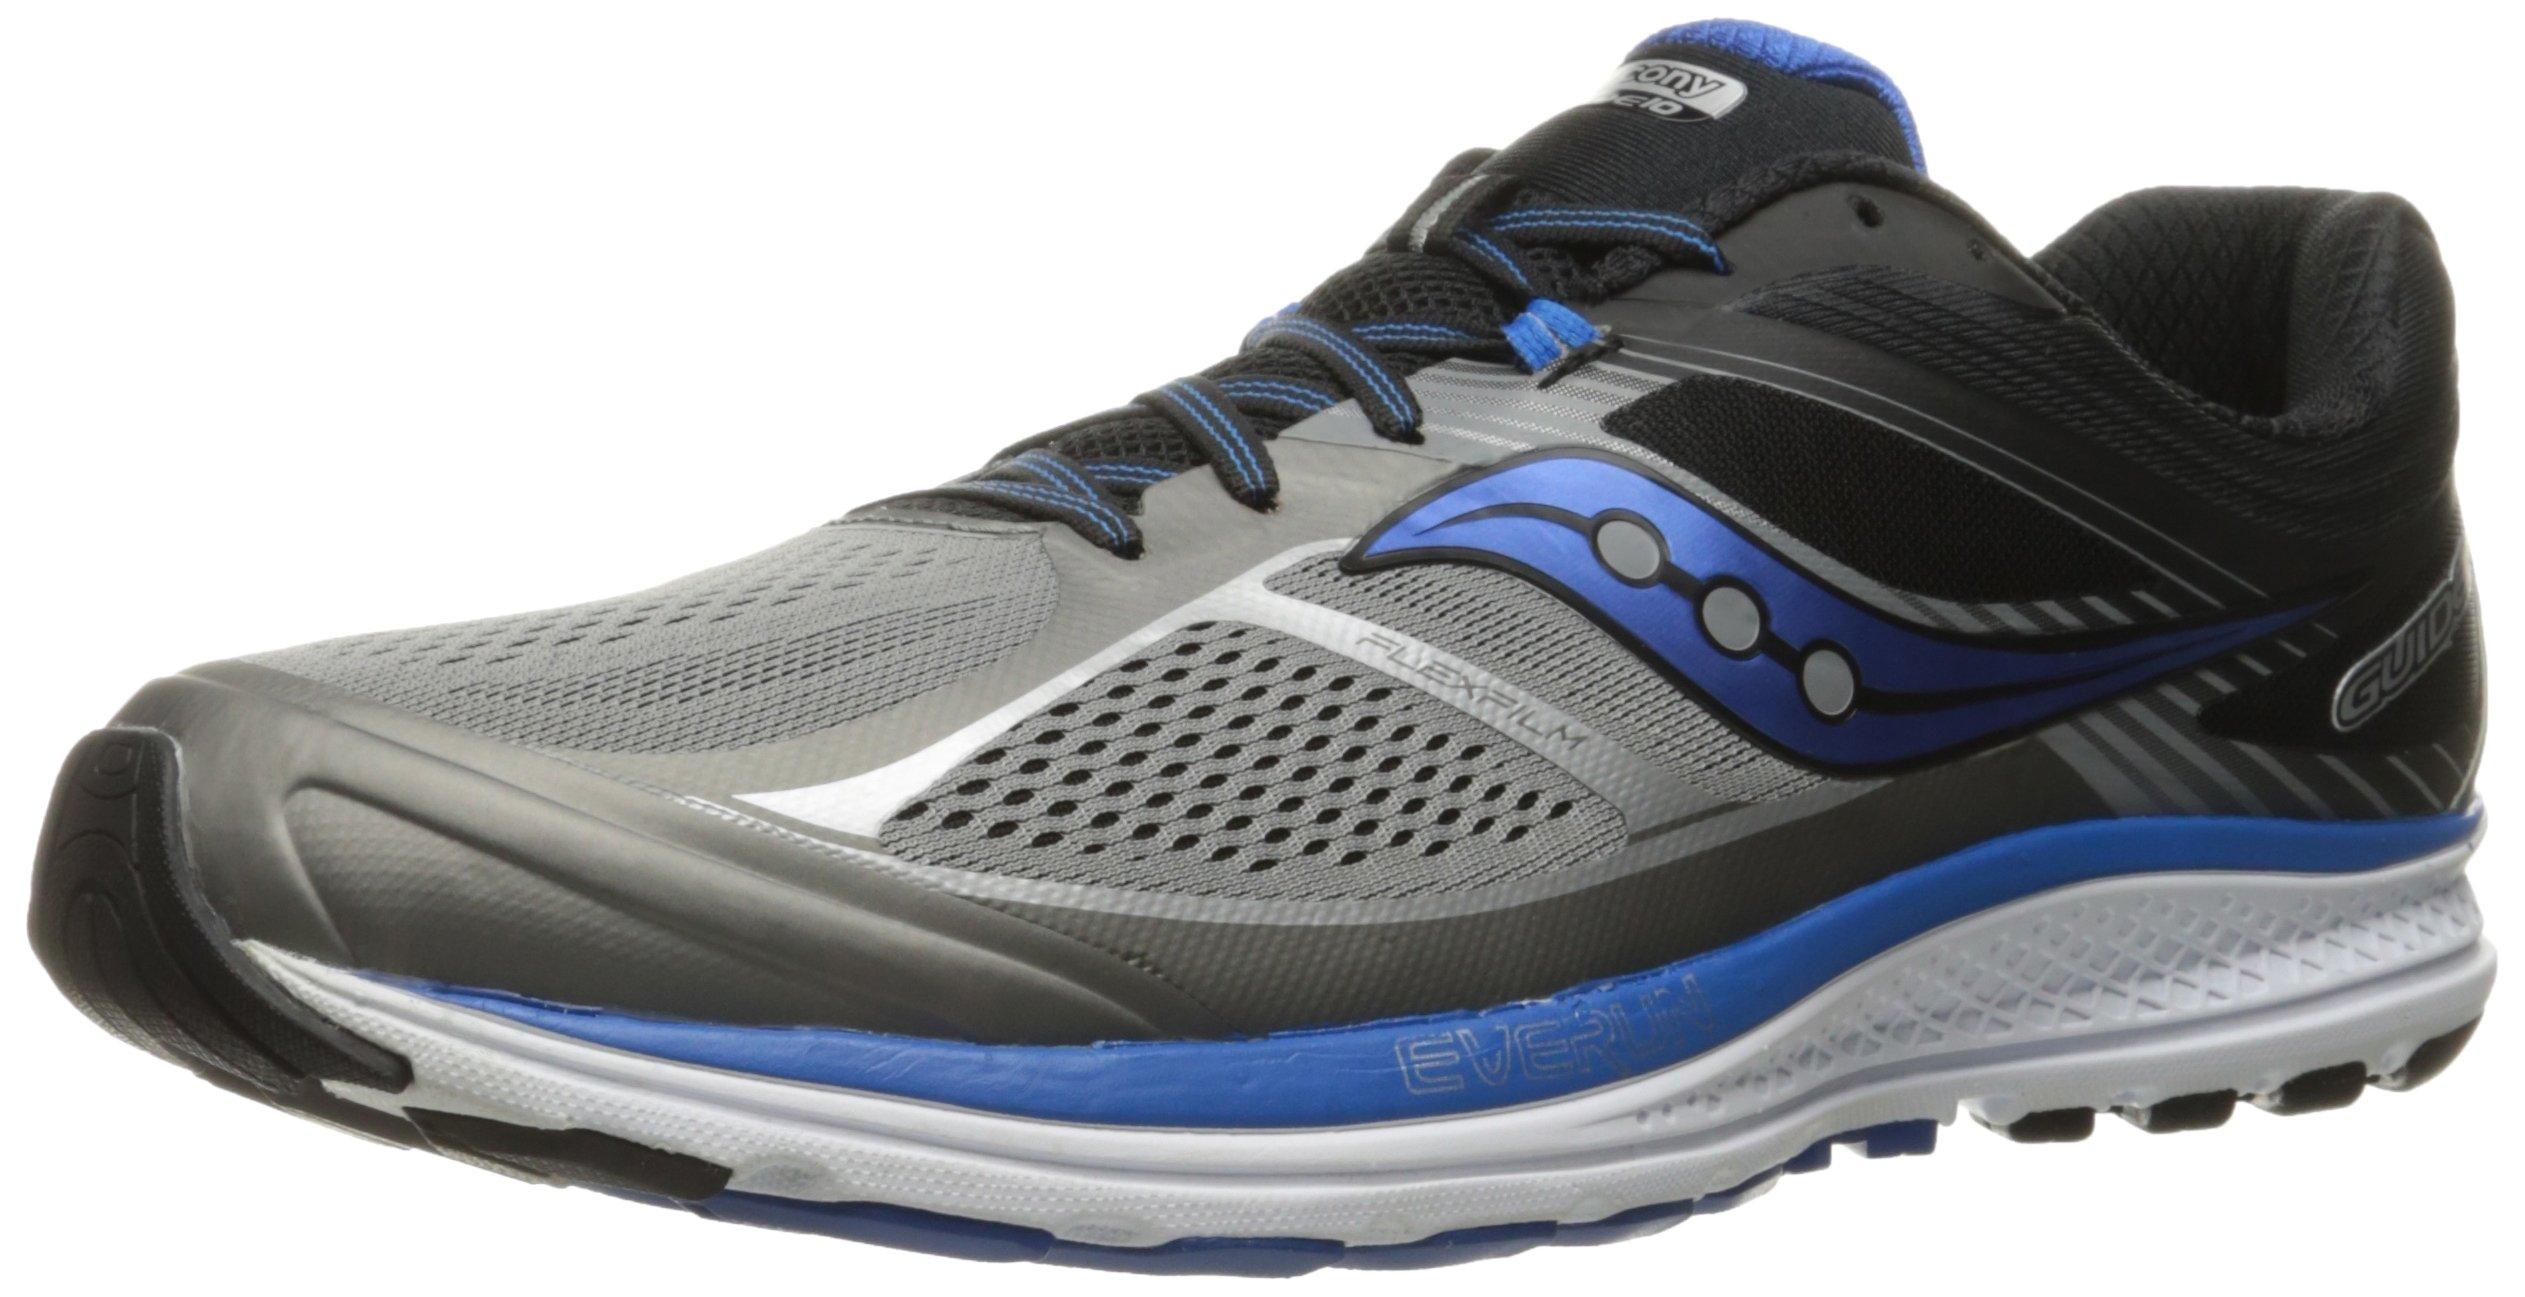 Saucony Men's Guide 10 Running Shoes, Grey Black, 14 D(M) US